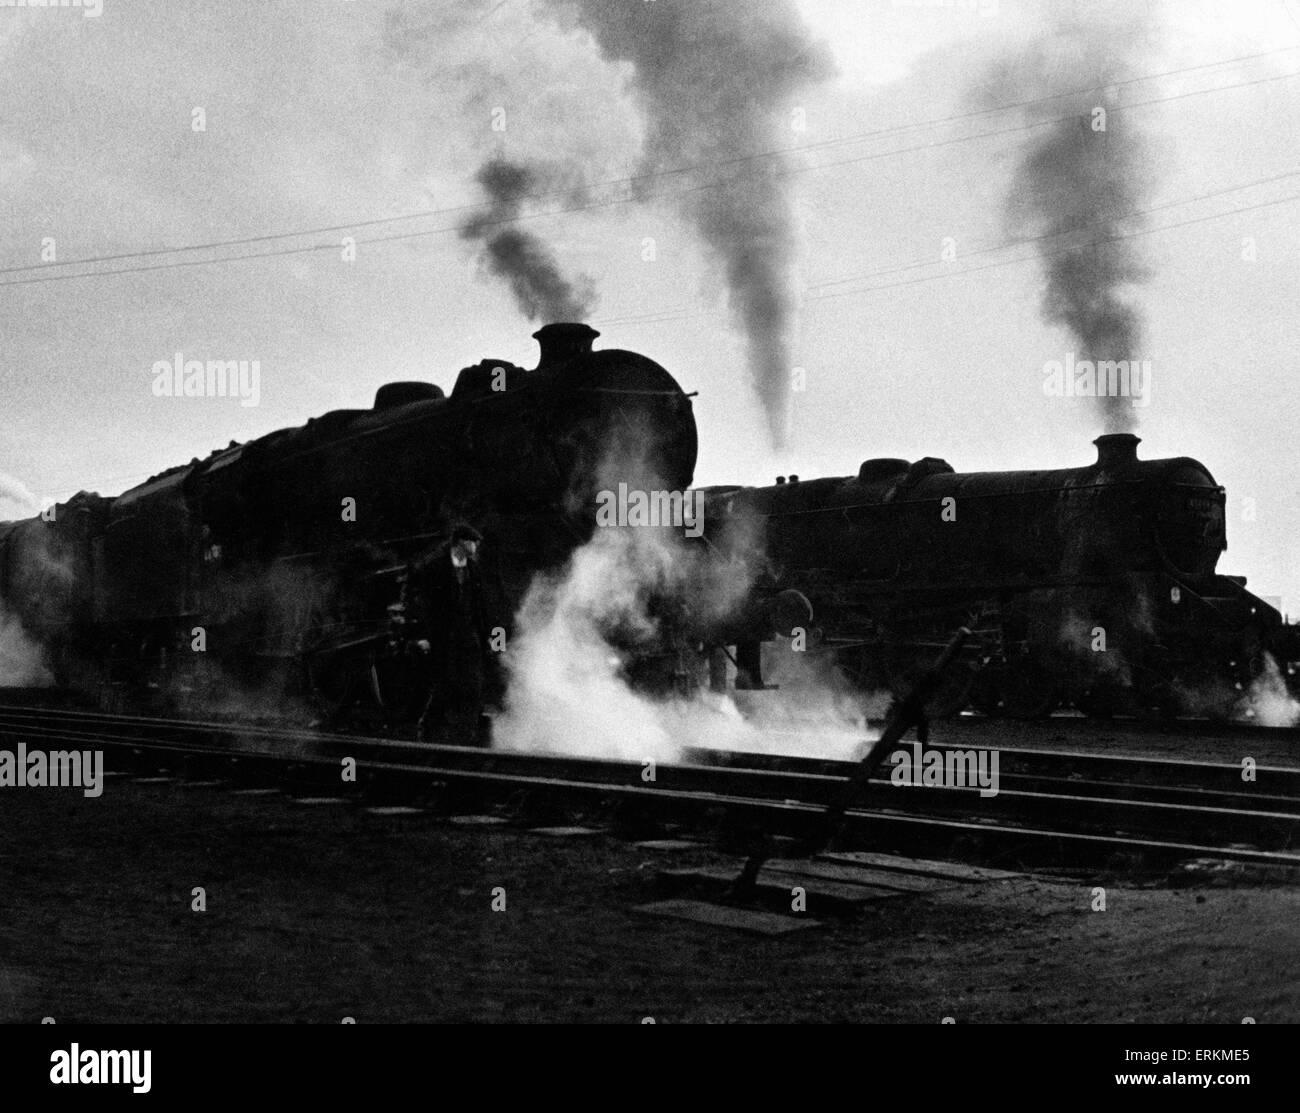 Steam locomotive engines steaming up on the tracks near Birmingham, circa 1960. - Stock Image